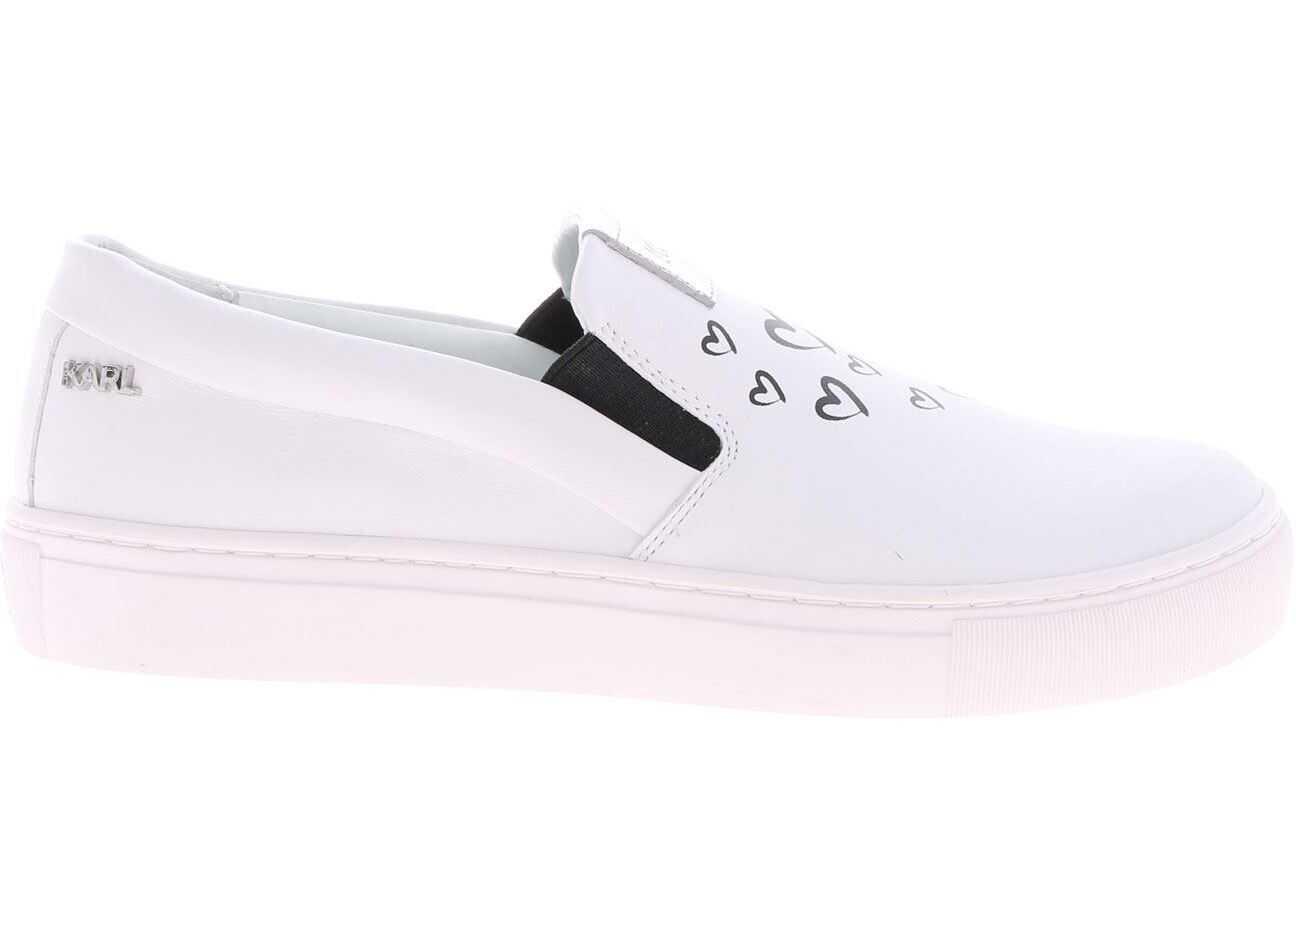 Karl Lagerfeld Kupsole Love Slip-On In White Leather KL61063 011 White imagine b-mall.ro